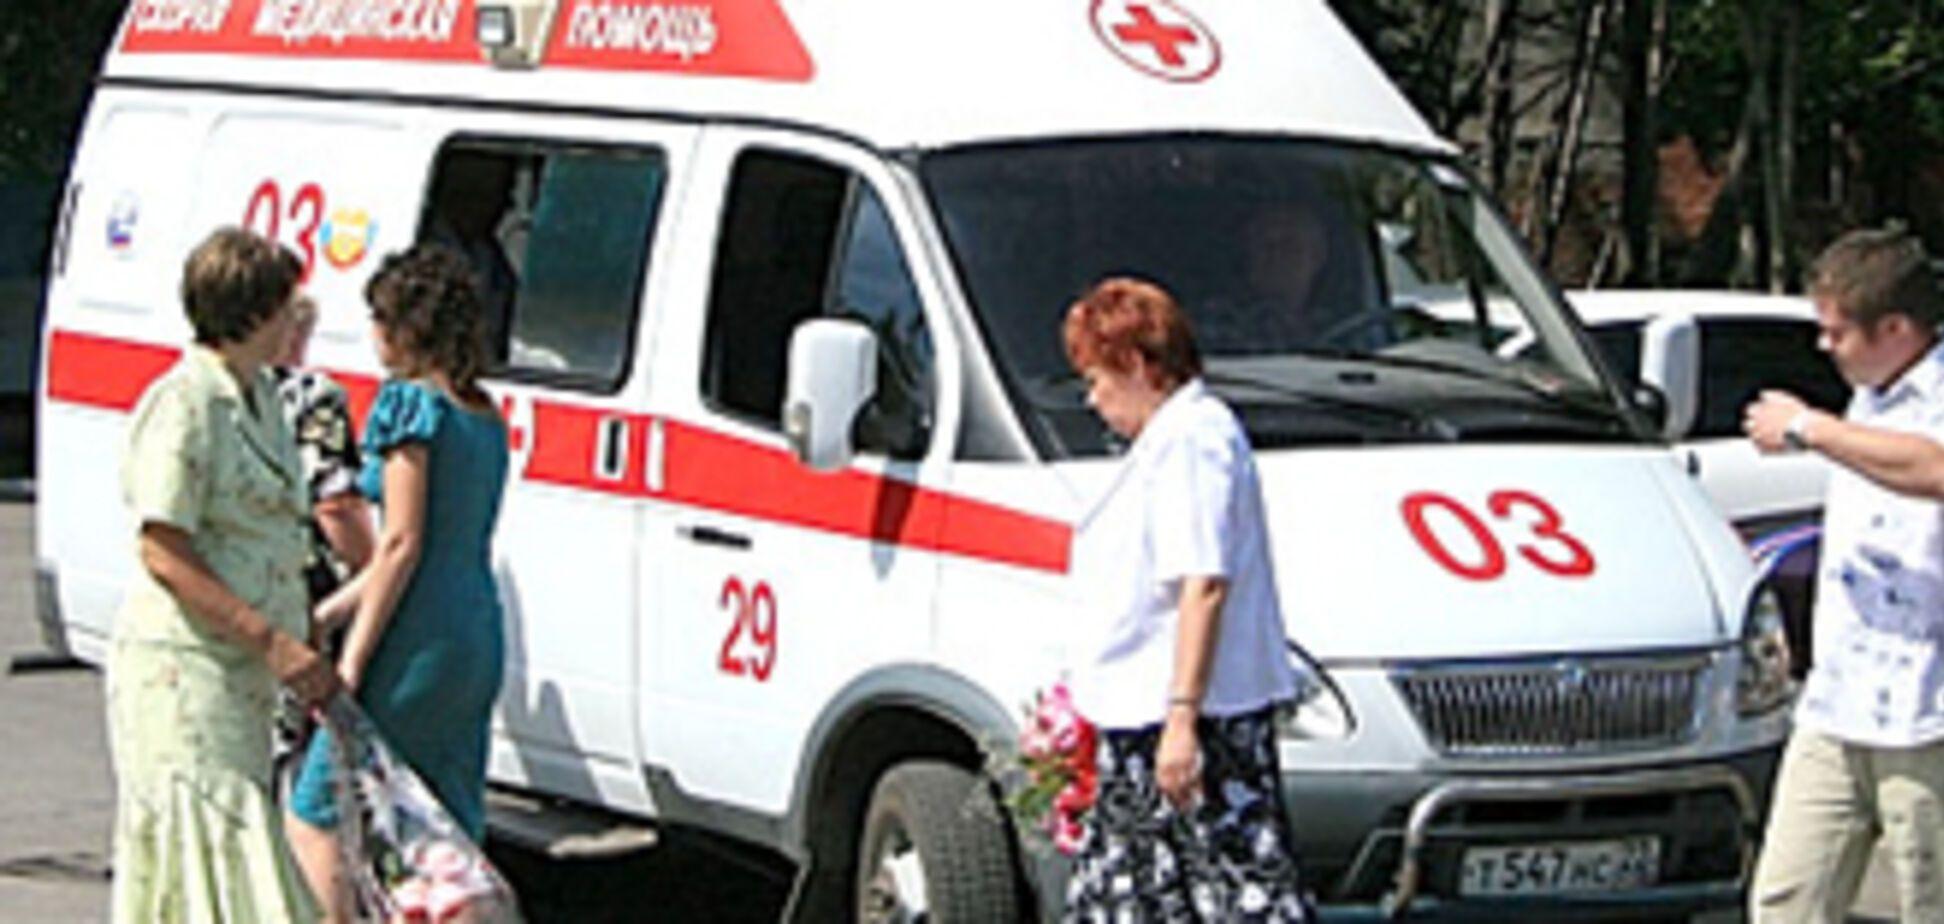 В Днепропетровске столкнулись авто и маршрутка: 6 жертв